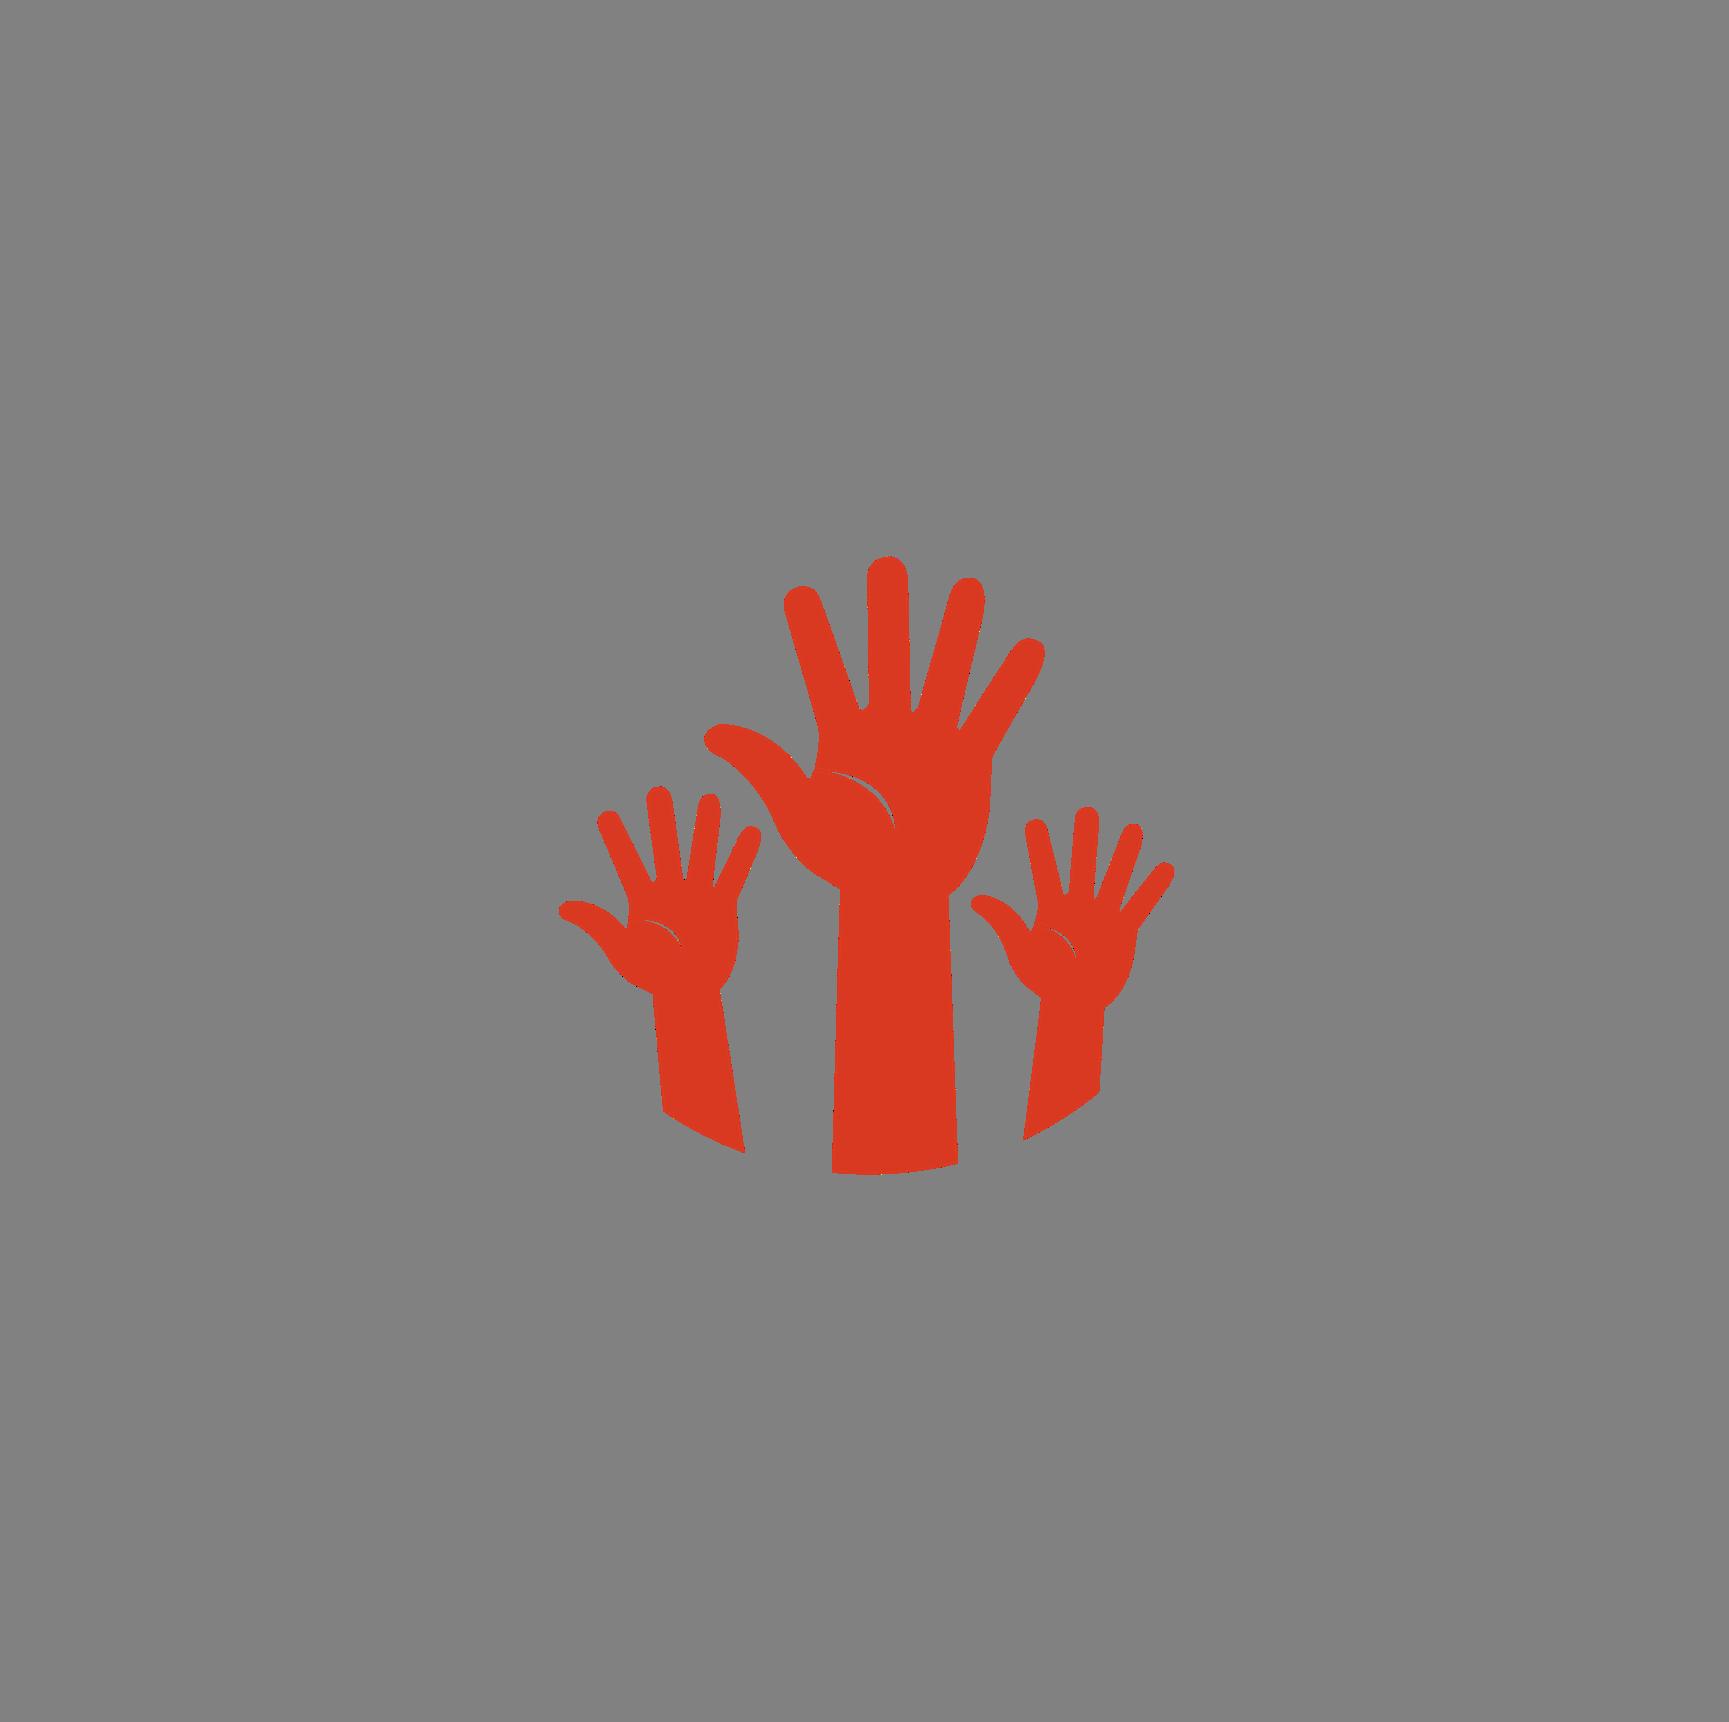 VolunteerIconSmall.png